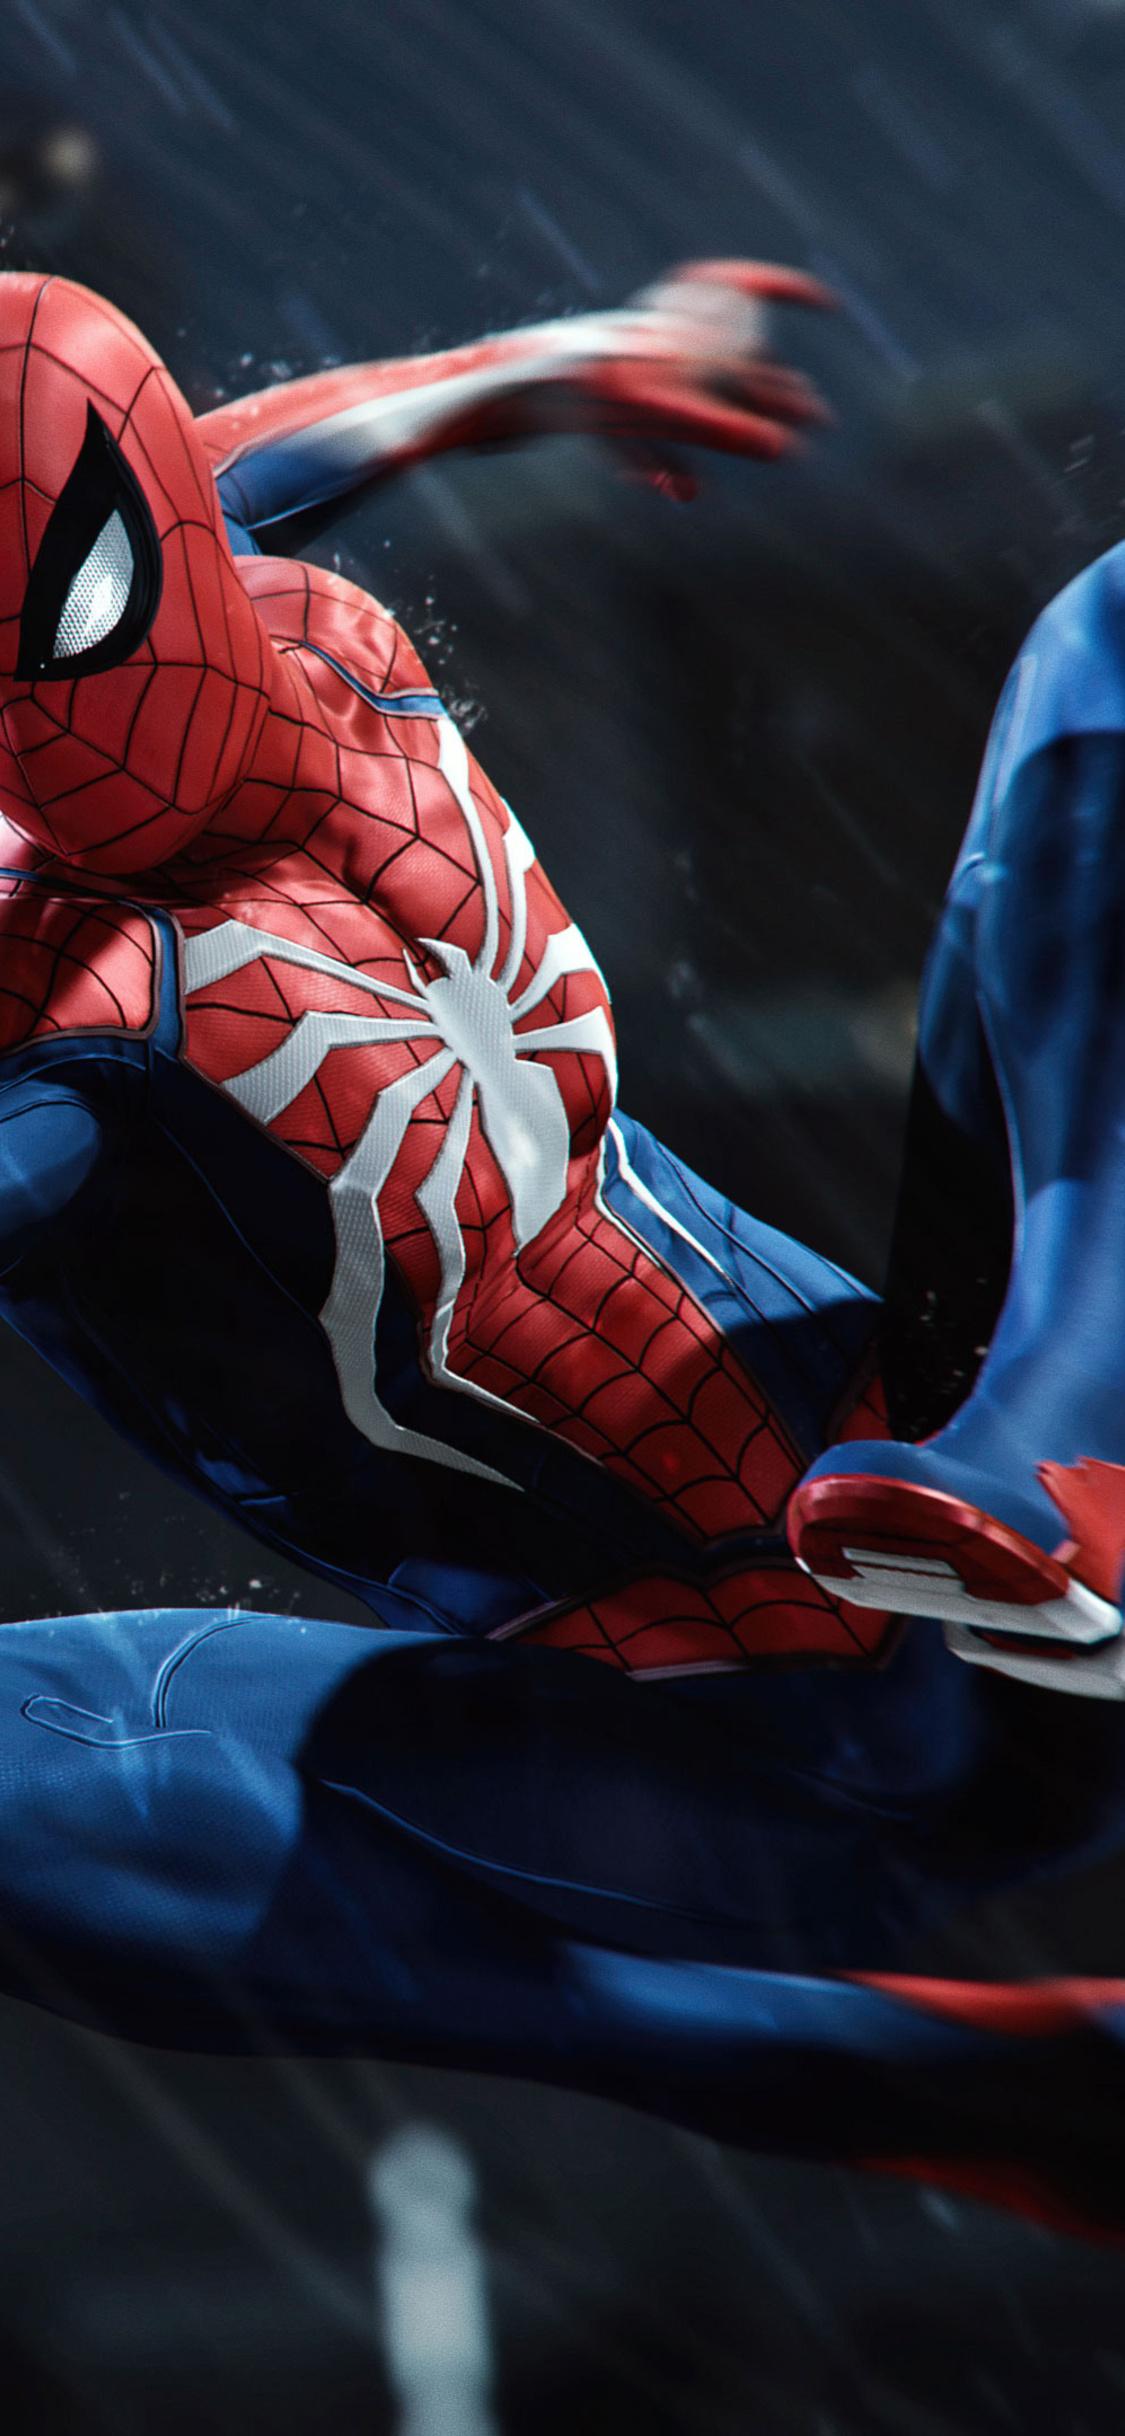 1125x2436 Spiderman Ps4 2018 E3 Iphone Xs Iphone 10 Iphone X Hd 4k